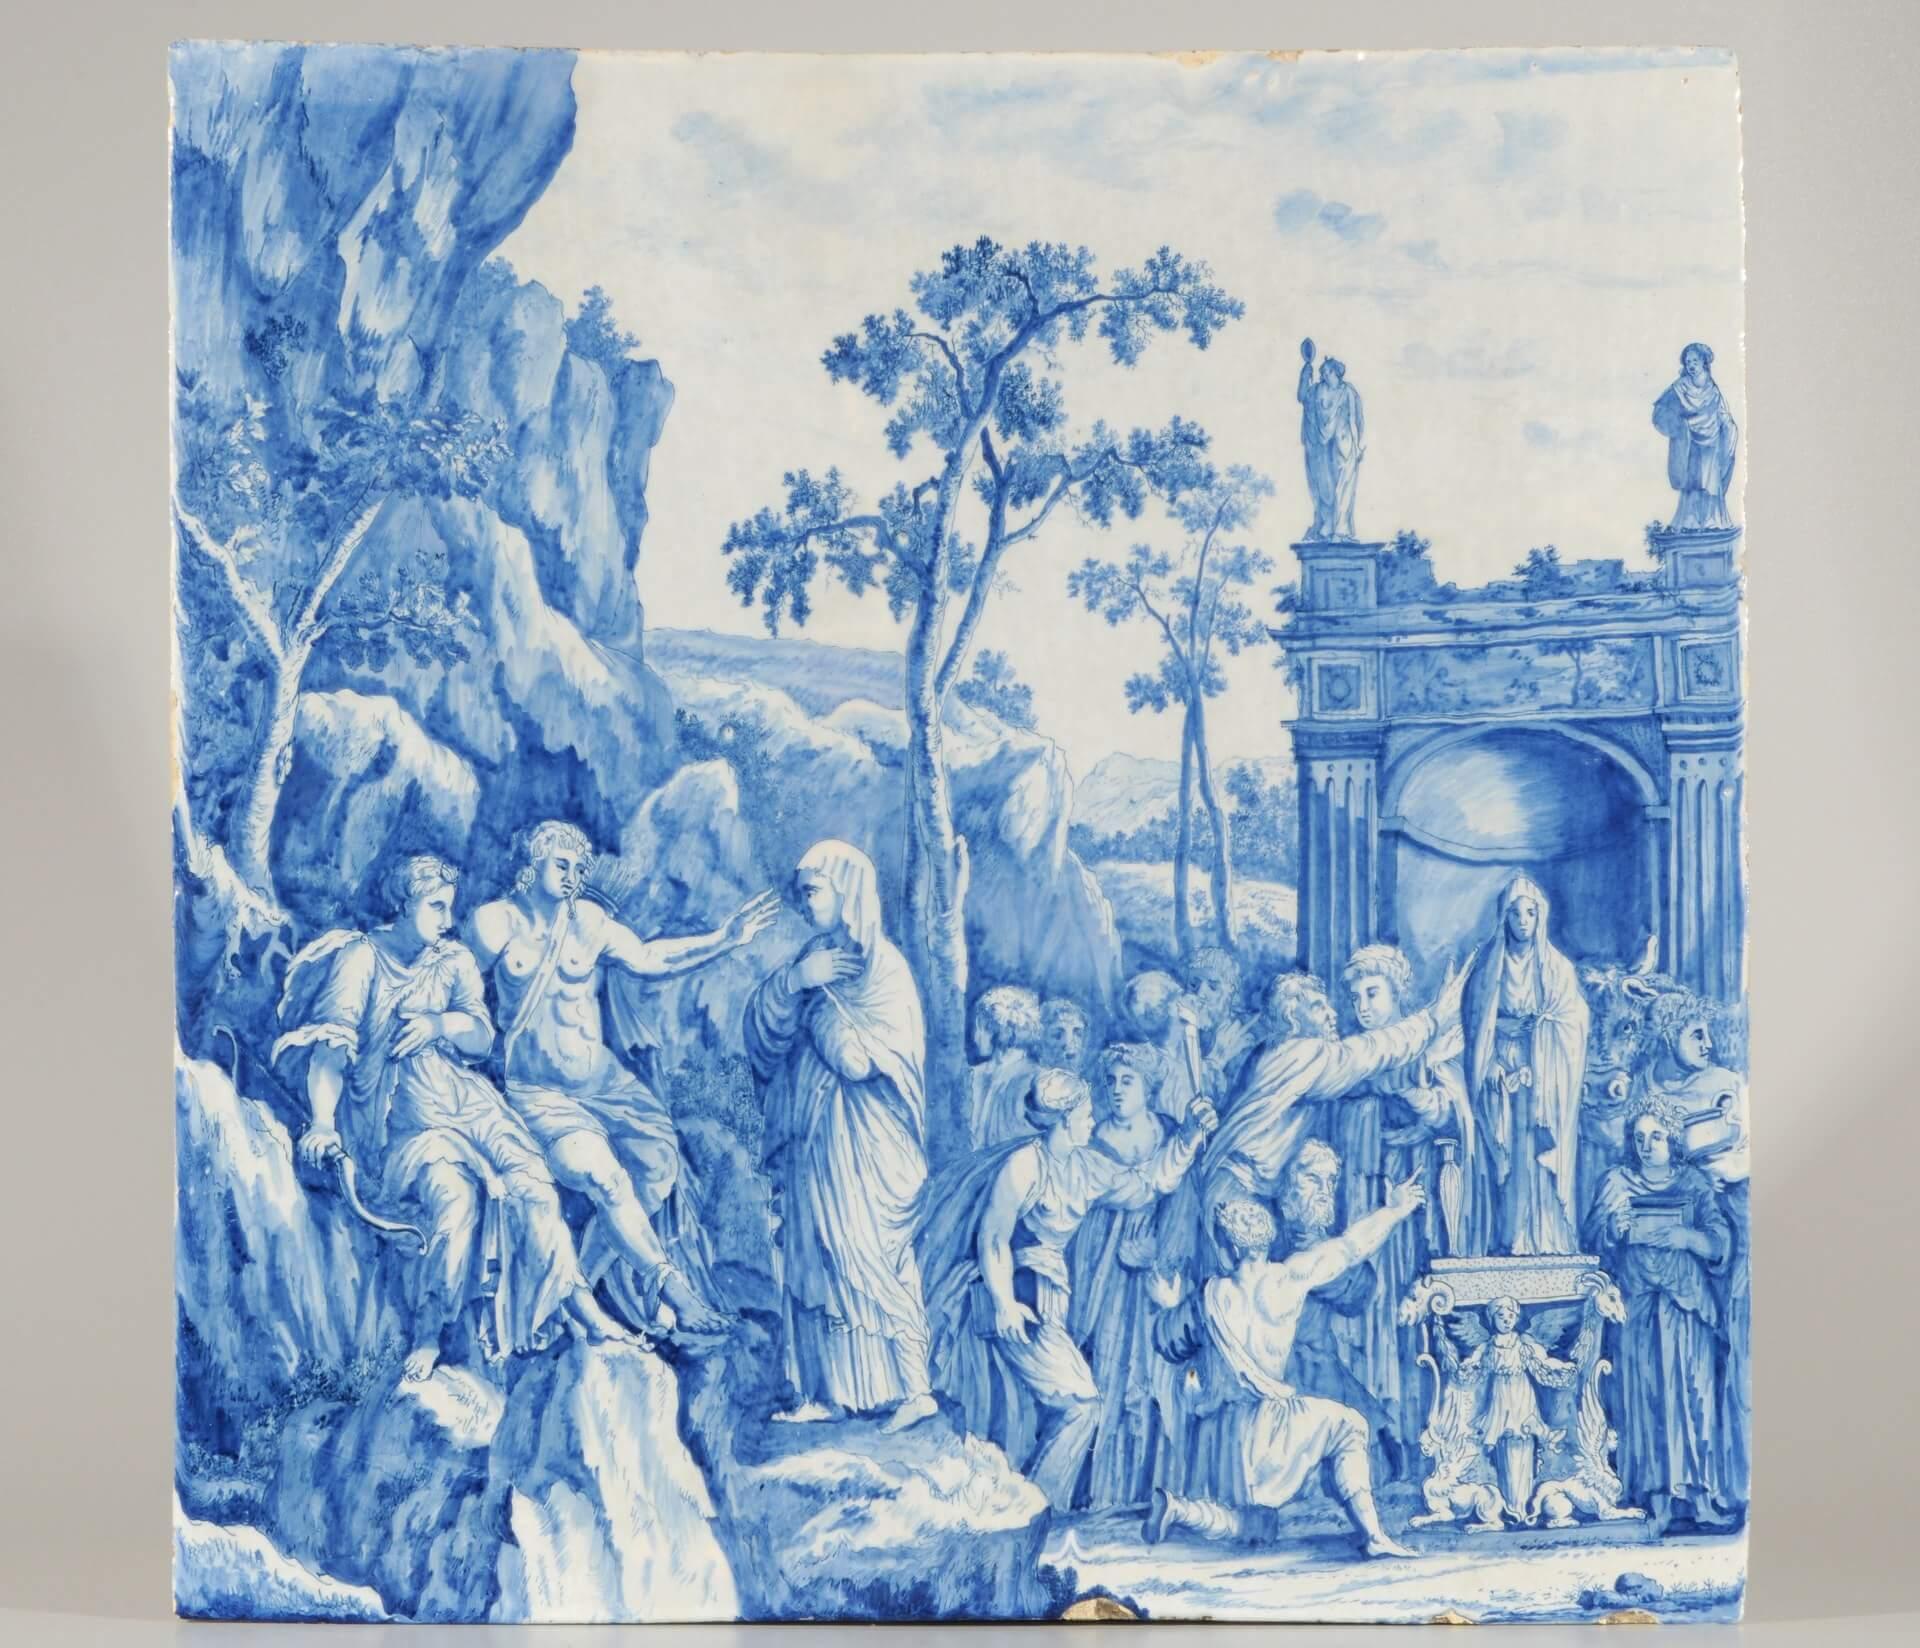 Aronson Antiquairs Delft blue pottery plaque of mythological story